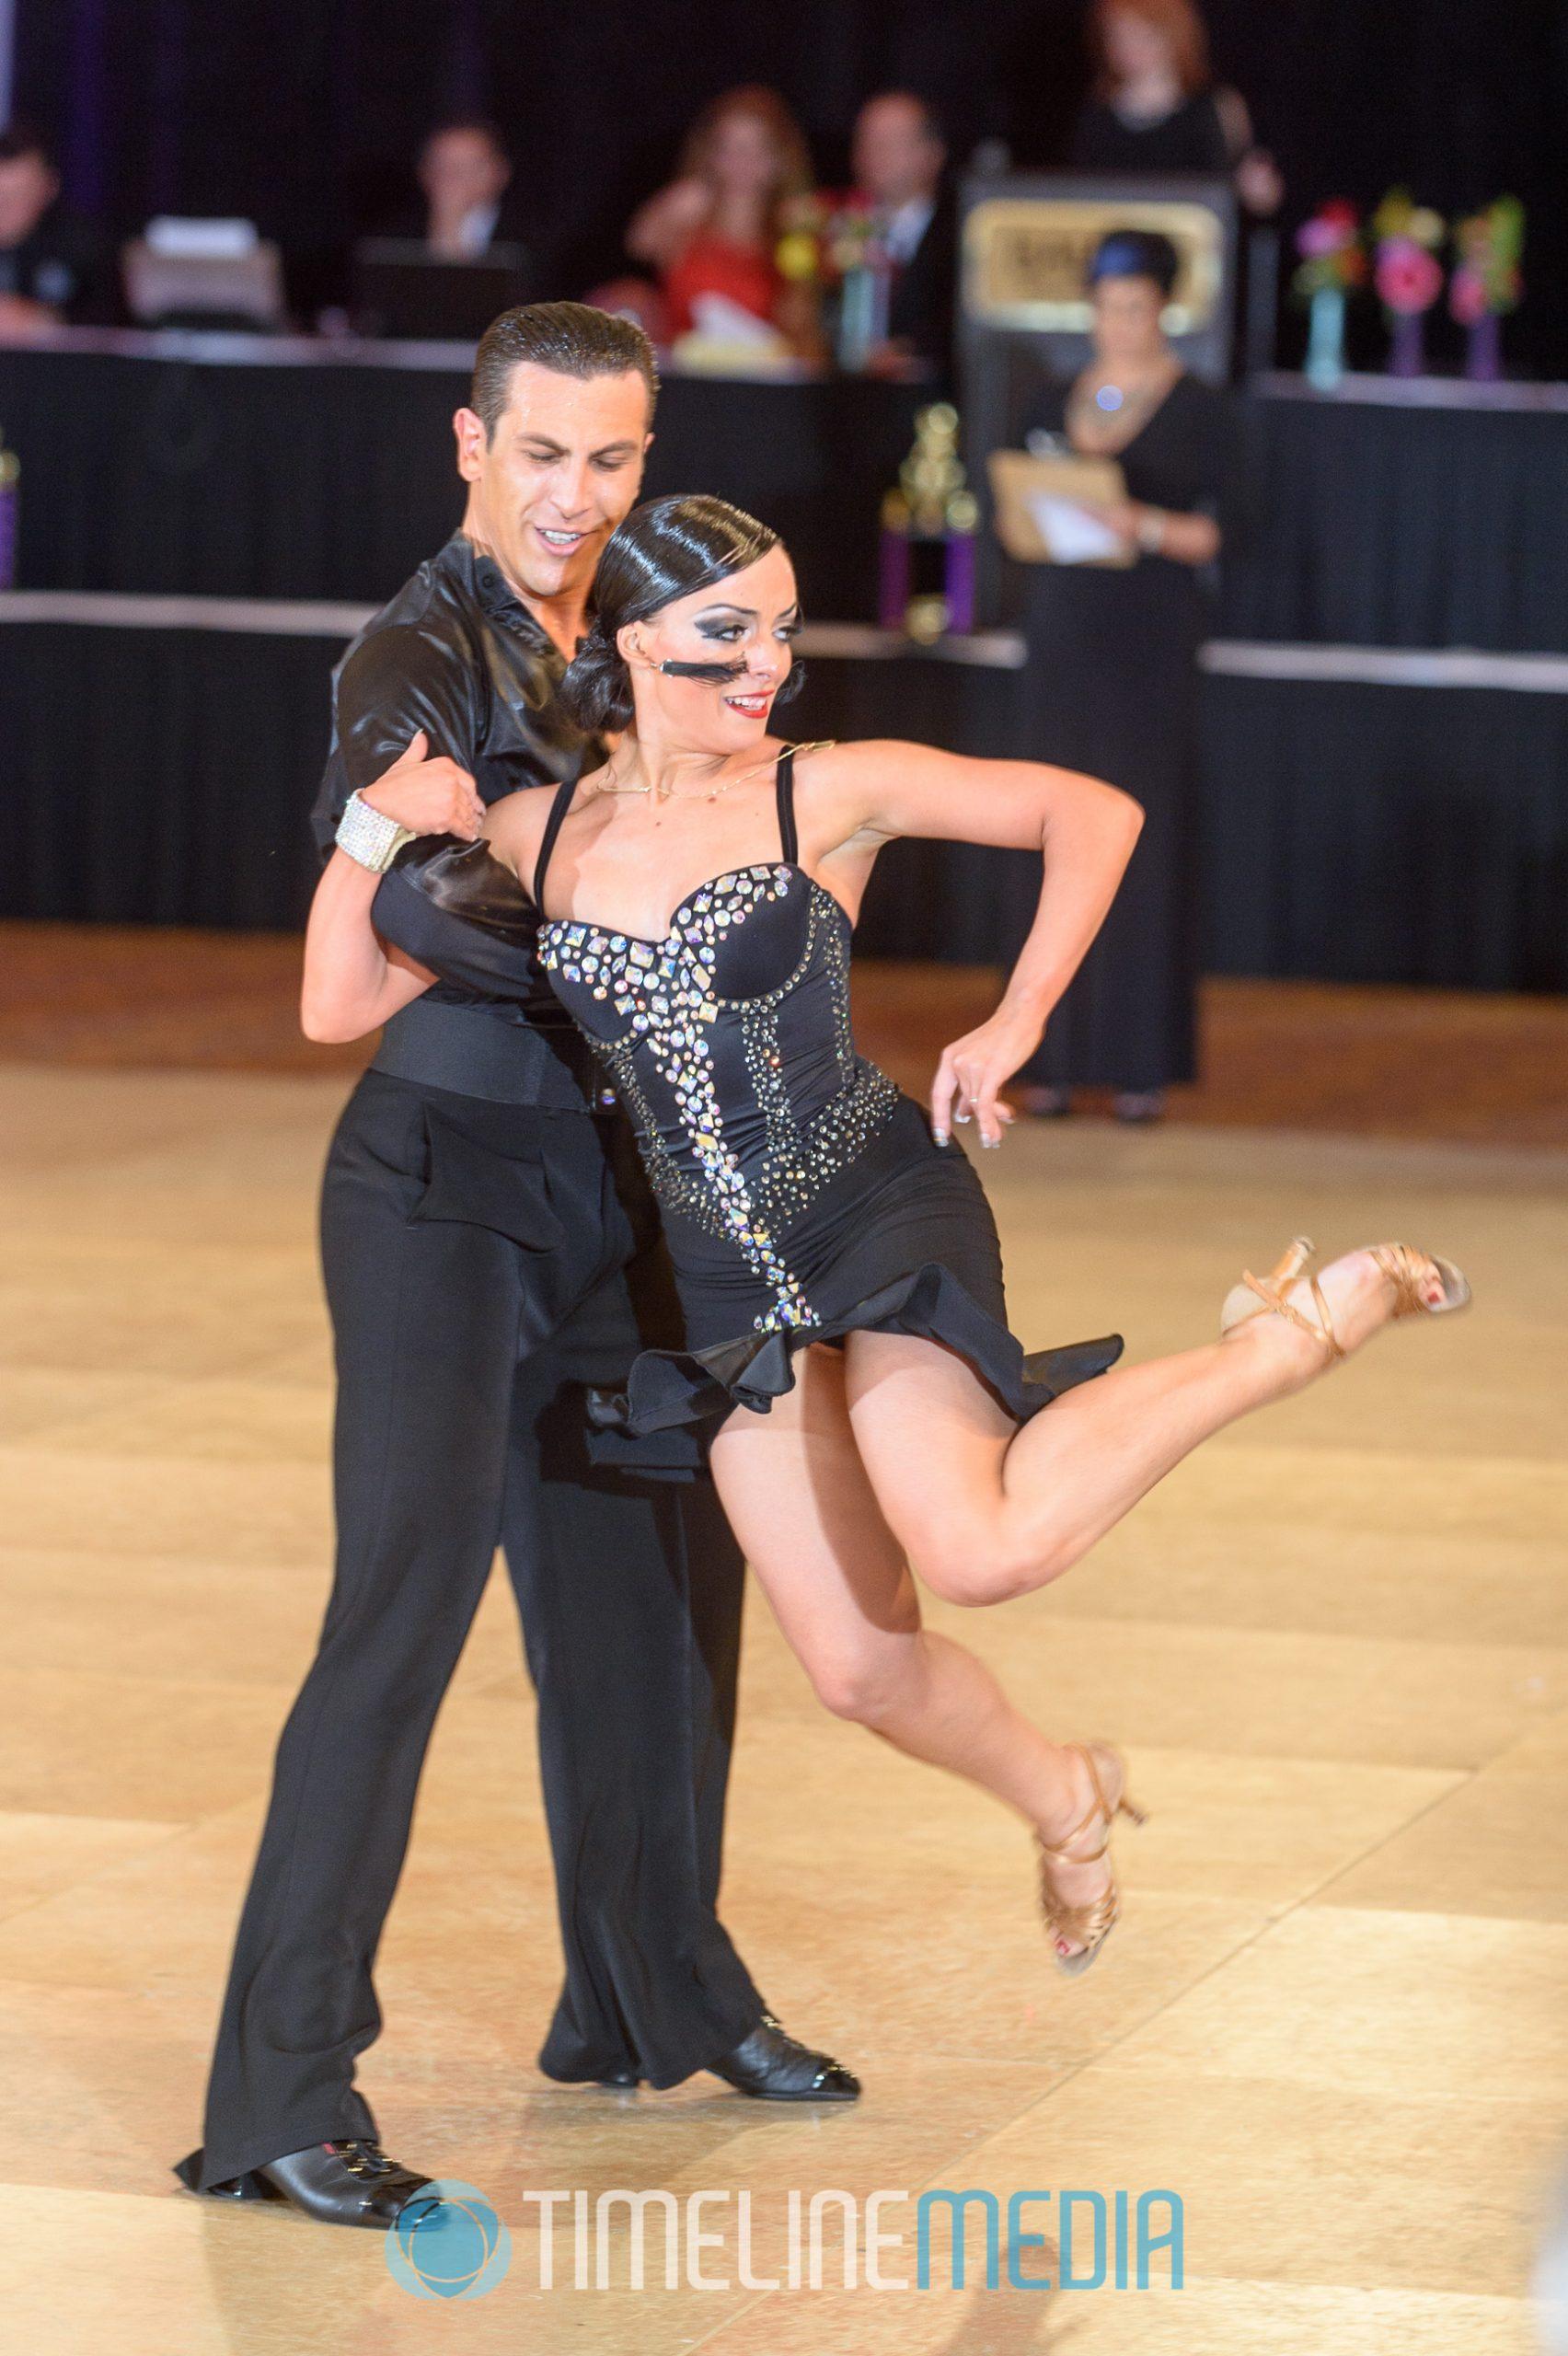 Dancers in competition ©TimeLine Media